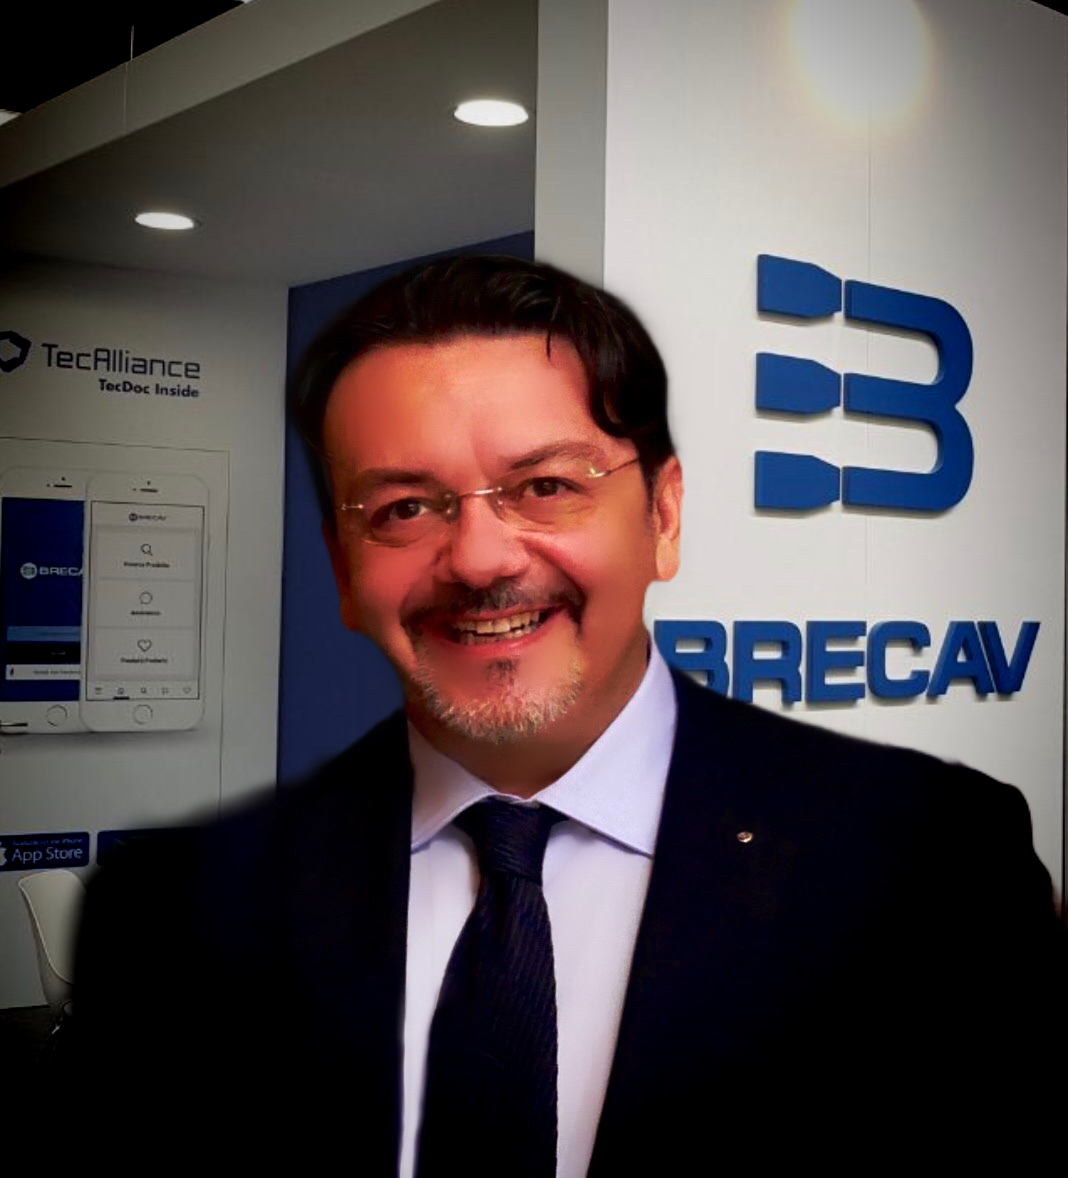 Angelo Raffaele Braia